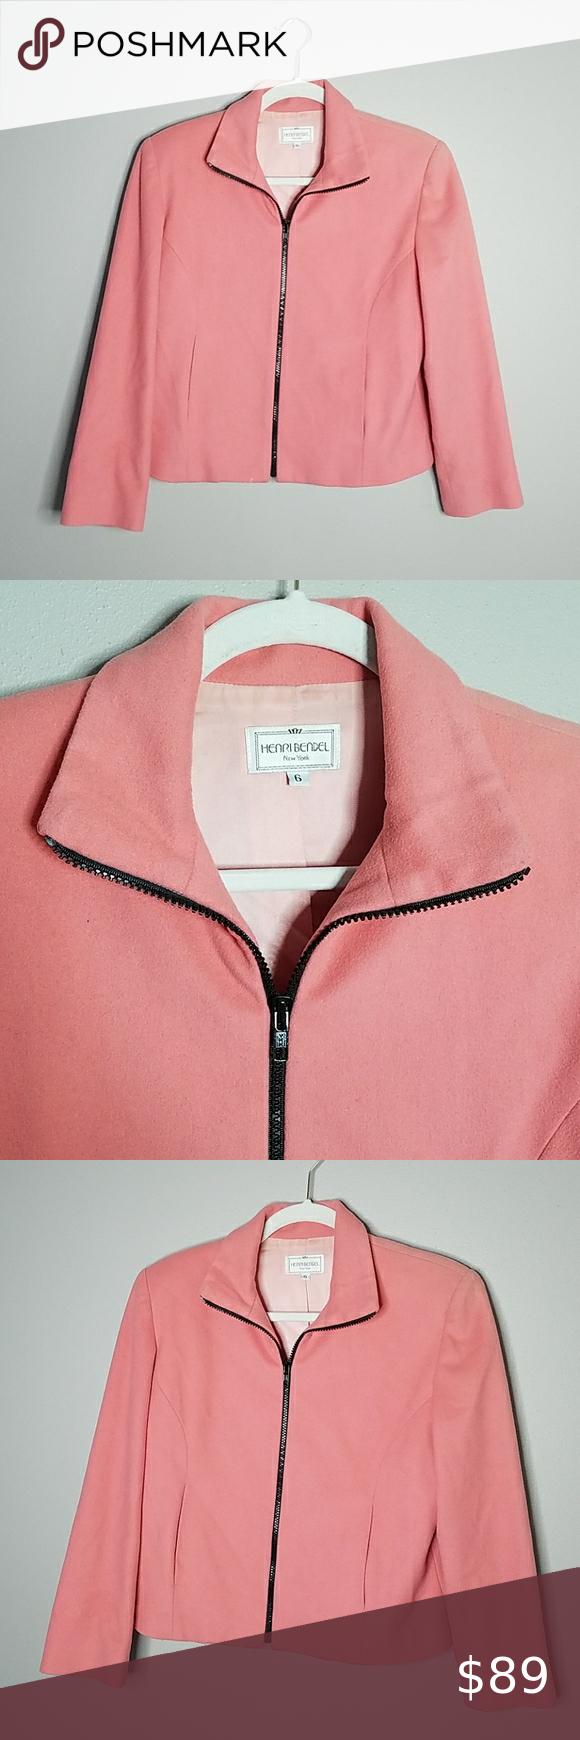 Henri Bendel Coat, Size 6 Vintage Henri Bendel Coat in Coral, Size 6.  Black Zipper with Two Pockets.  Shell-80% Wool, 20% Cashmere.  Lining-100% Acetate.   Measures approximately 21.5